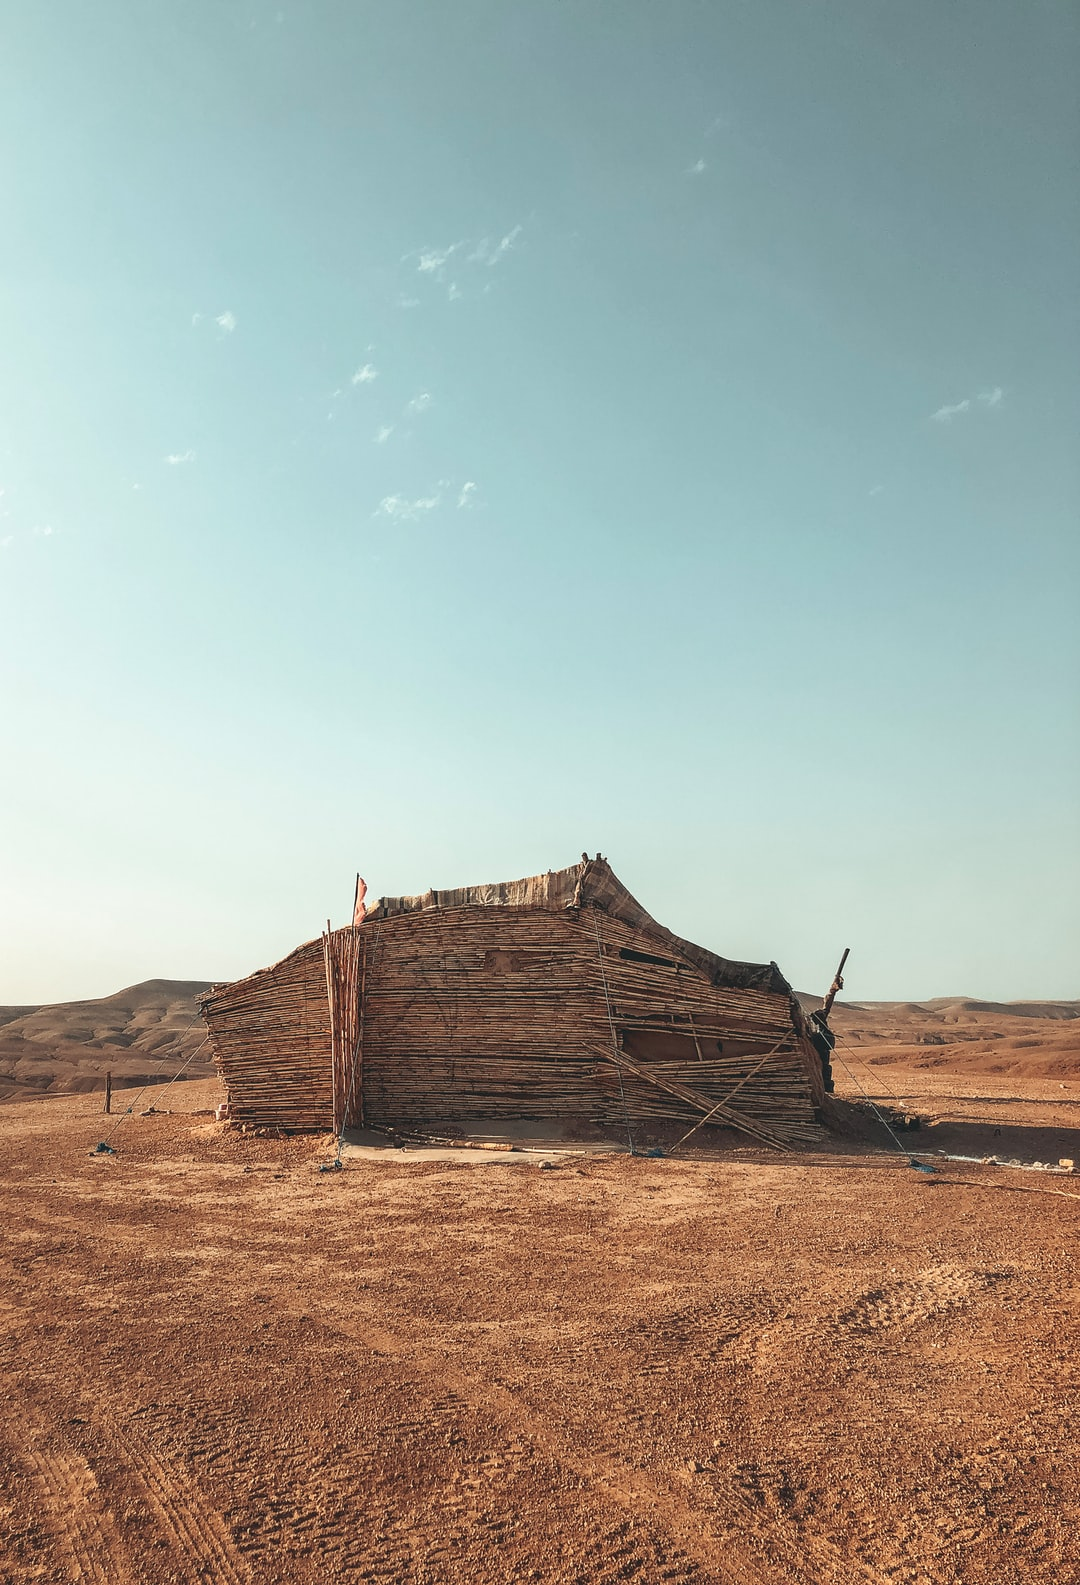 Berber tent in Morocco desert